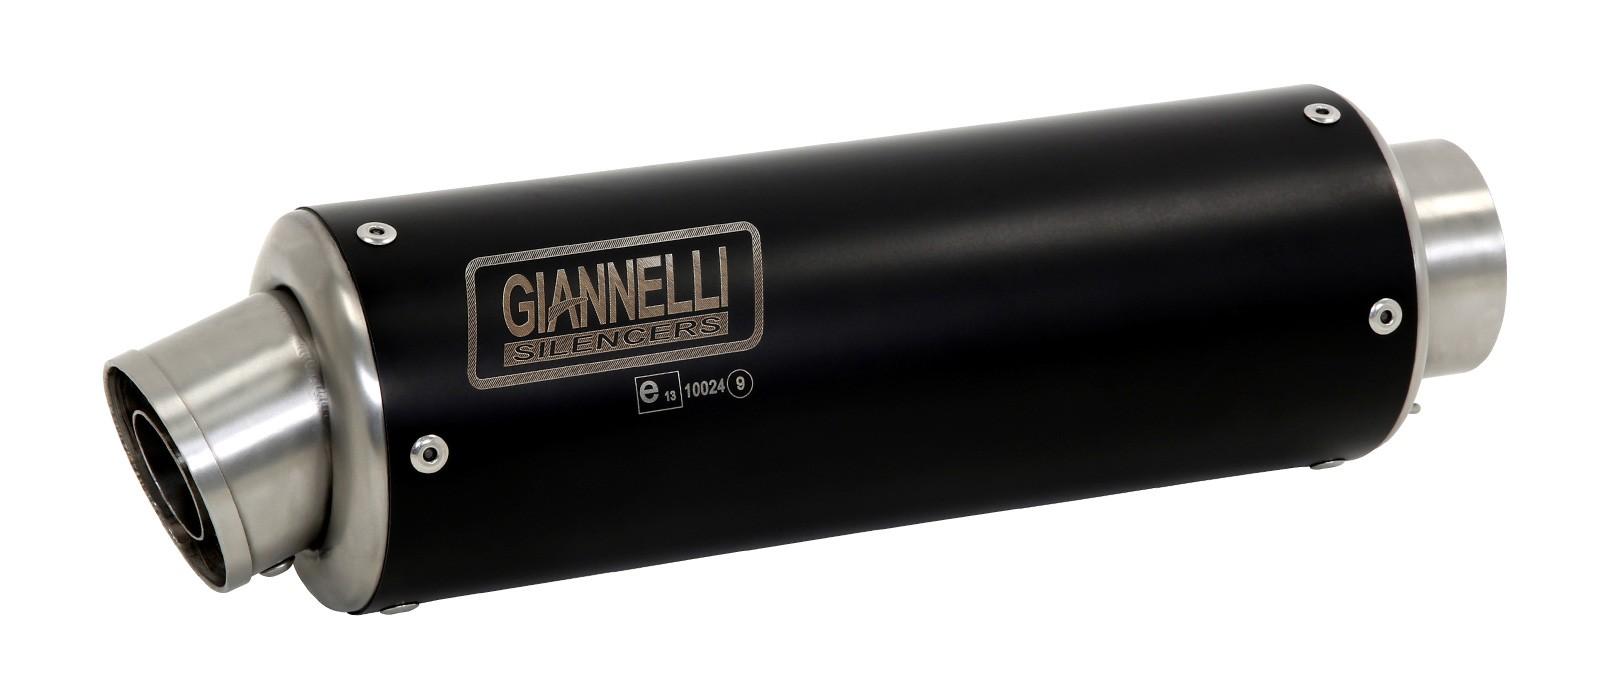 ESCAPES GIANNELLI YAMAHA - Sistema completo nicrom X-PRO Yamaha XSR 900 Giannelli 73572XPI -